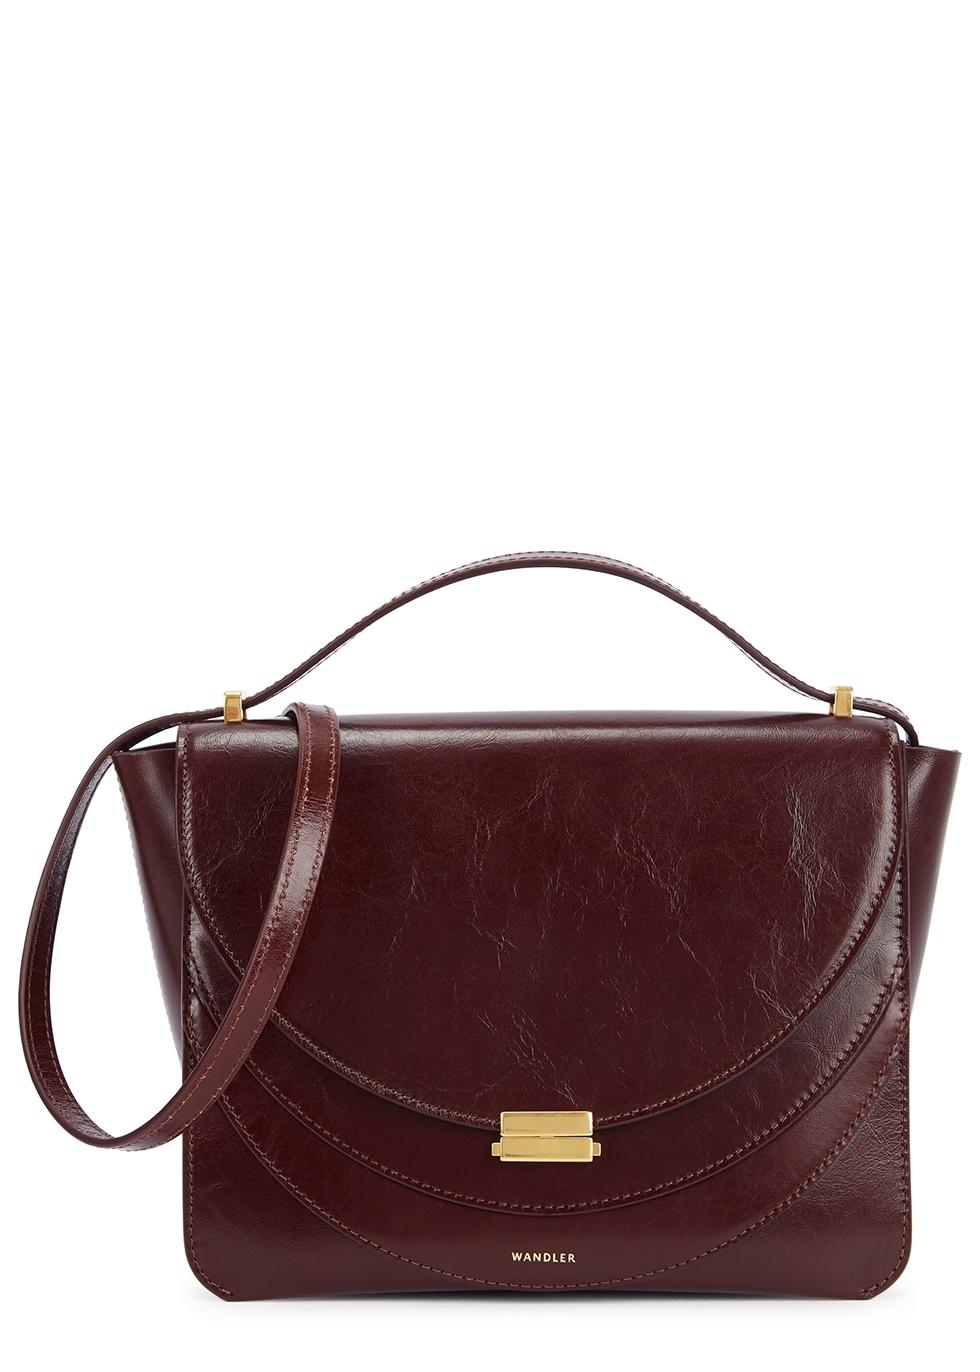 e8653d8346d6 Women's Designer Cross-Body Bags - Harvey Nichols